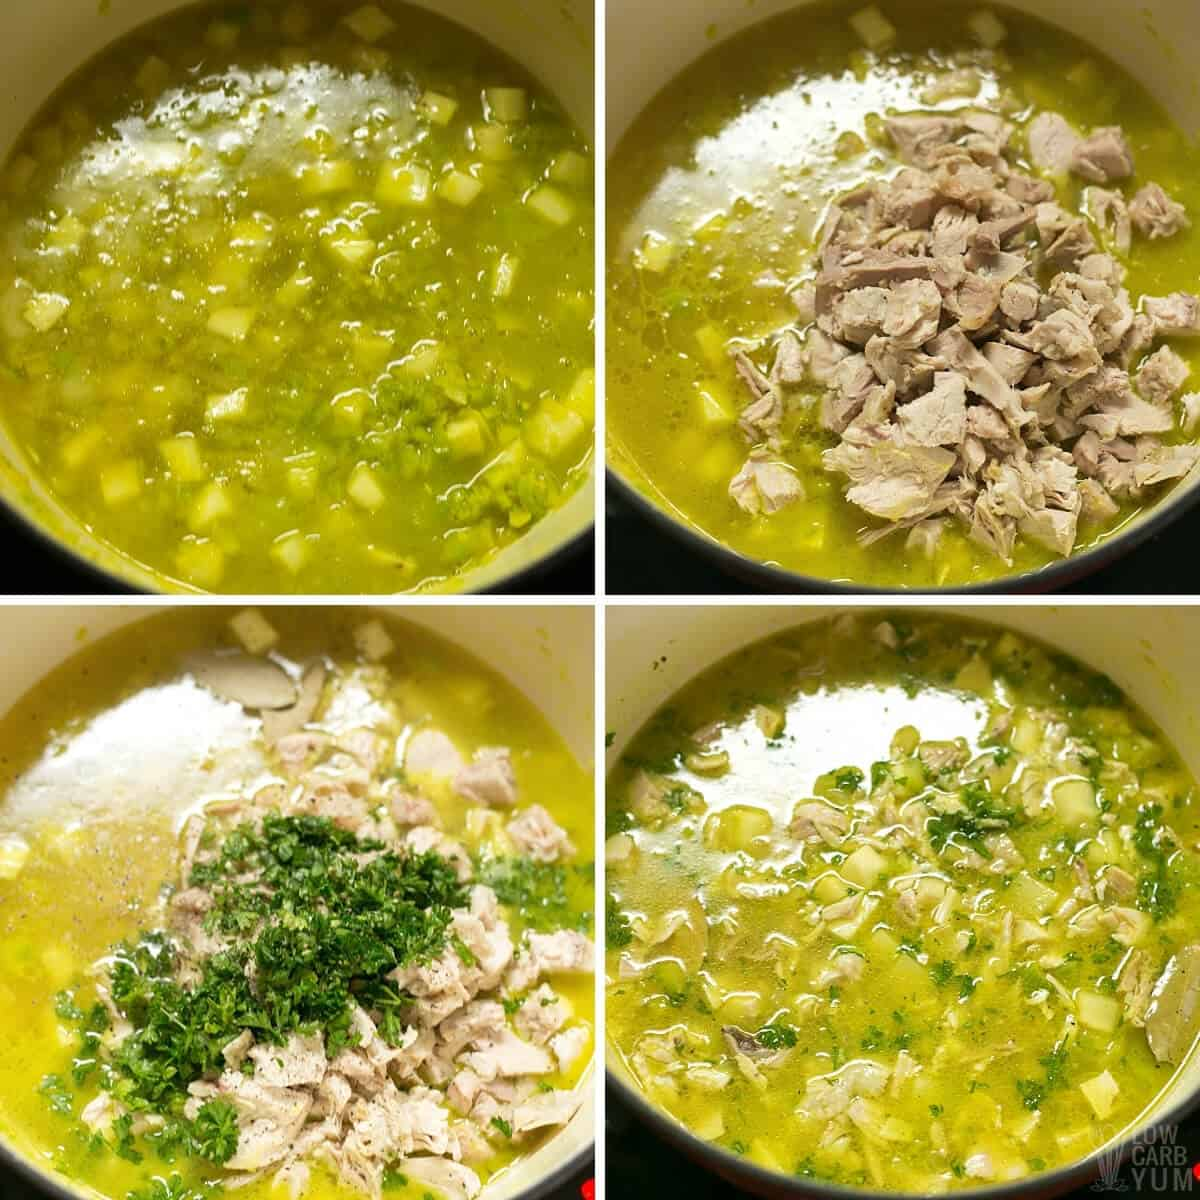 adding broth chicken seasonings